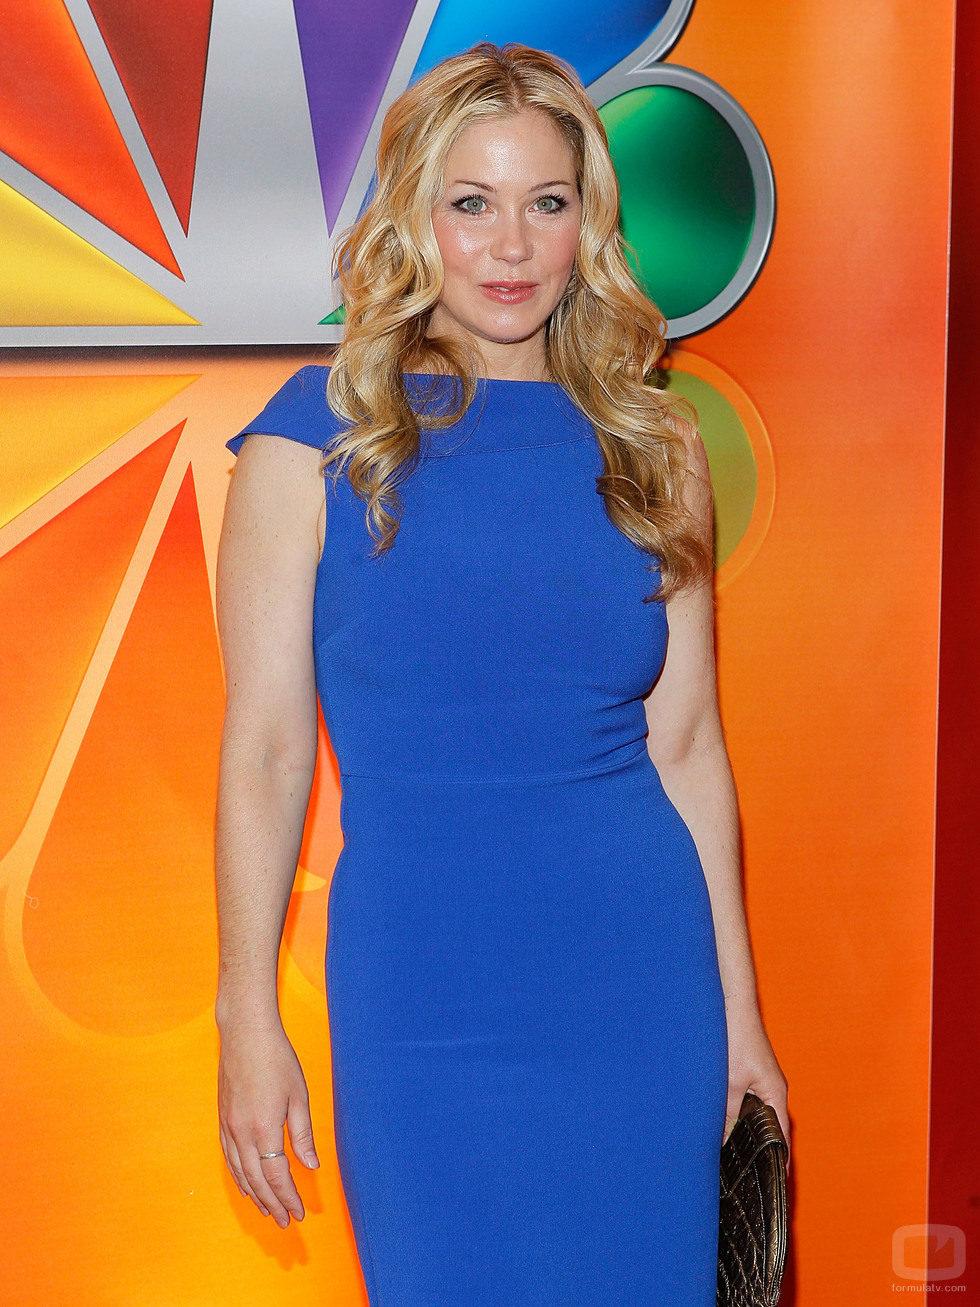 Christina Applegate en los Upfronts 2012 de NBC